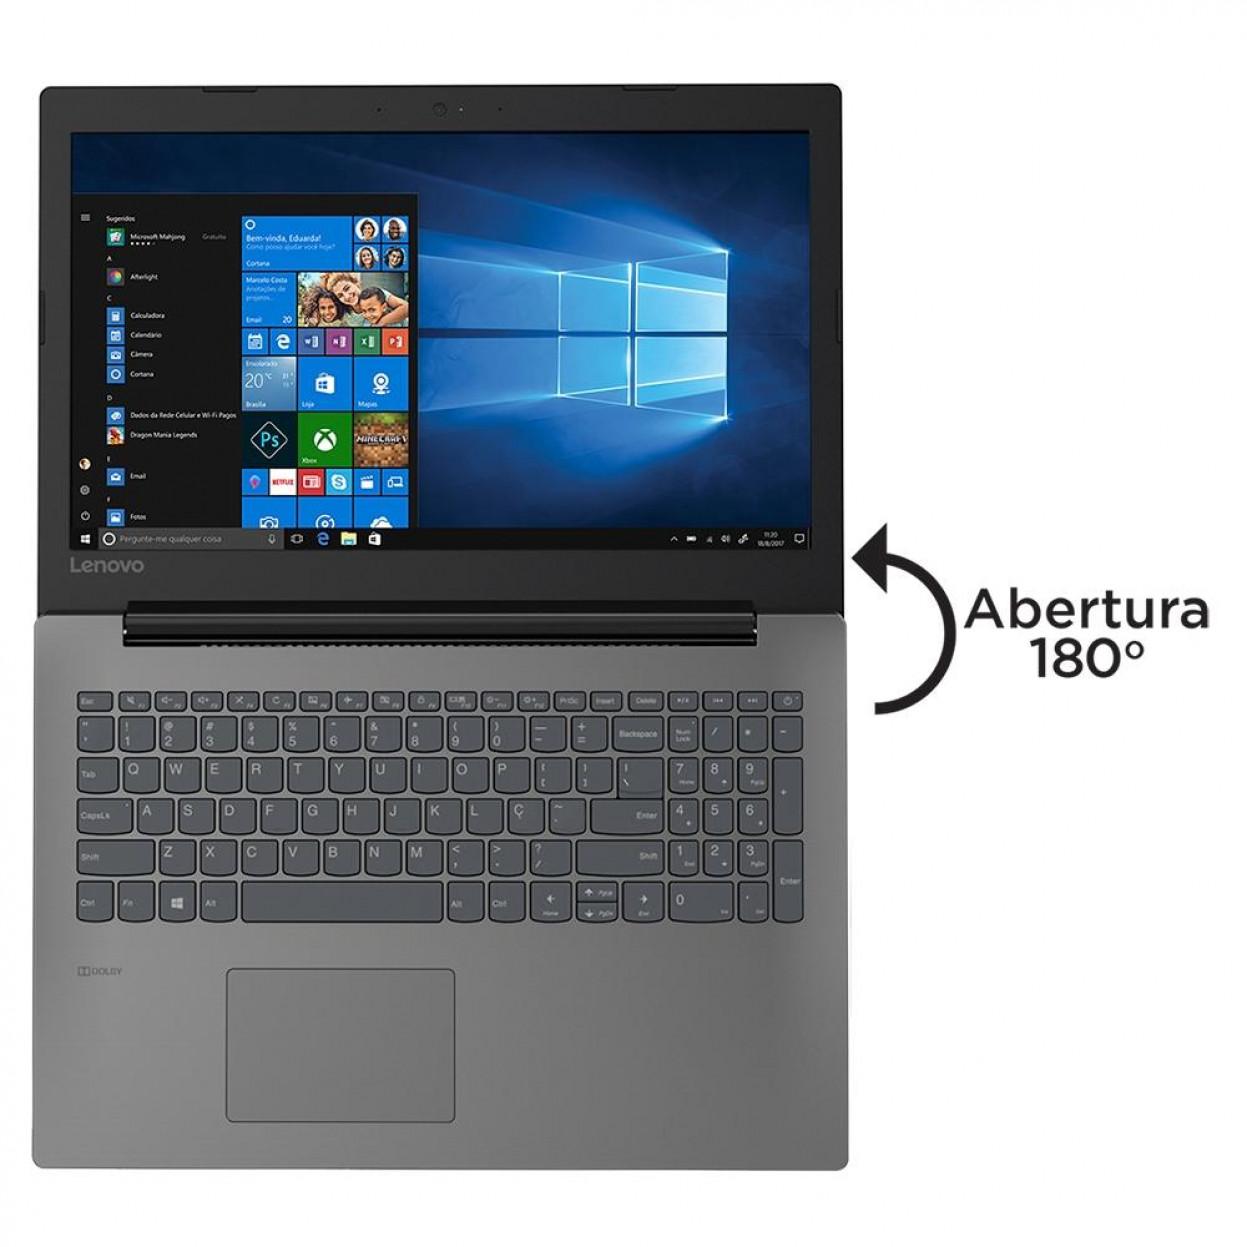 Notebook Lenovo B330 Core I3 7020u Memoria 12gb Ssd 480gb Tela 15.6' Hd Windows 10 Home